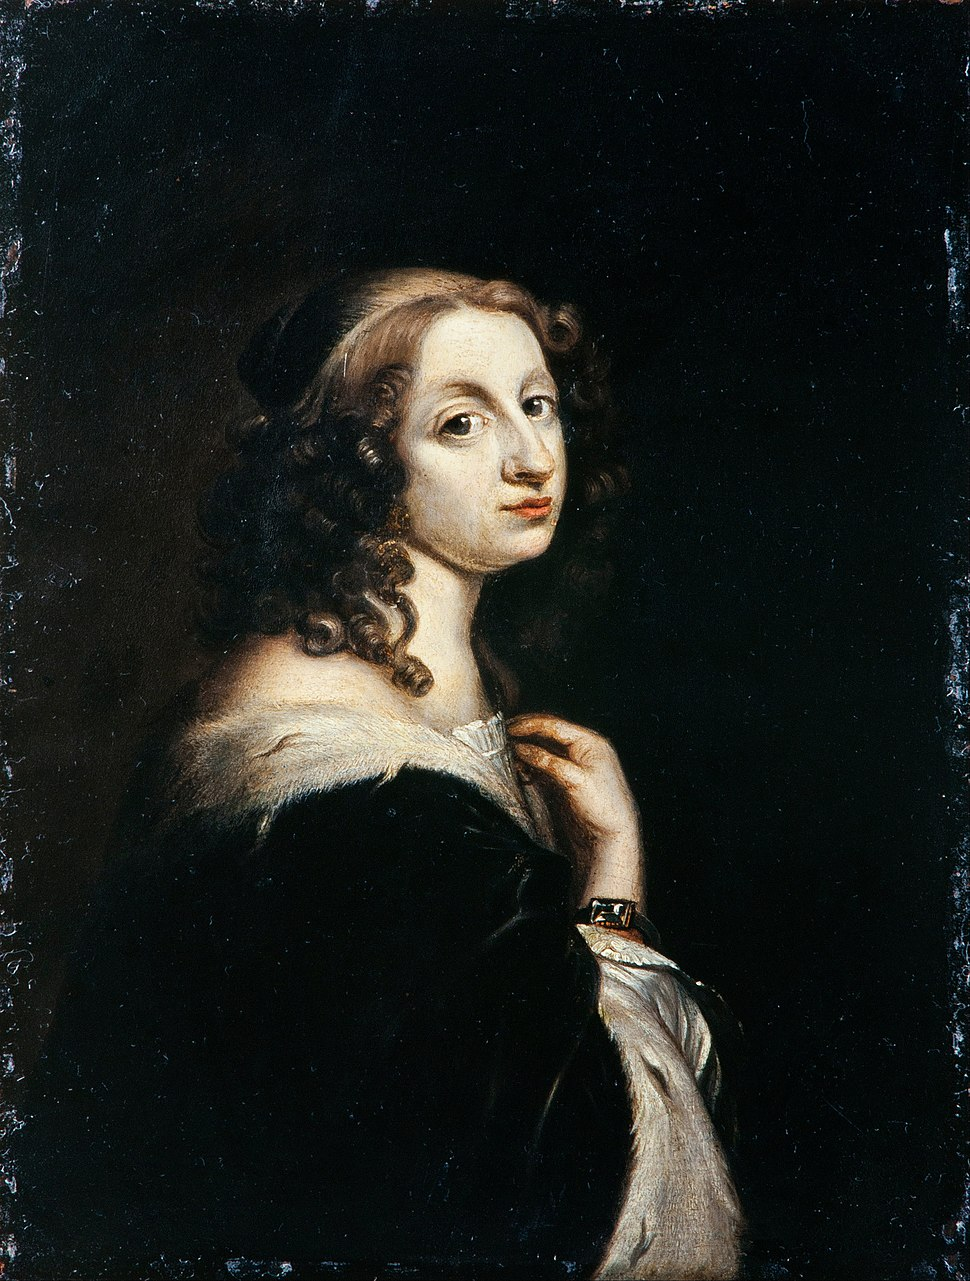 David Beck - Christina, Queen of Sweden 1644-1654 - Google Art Project